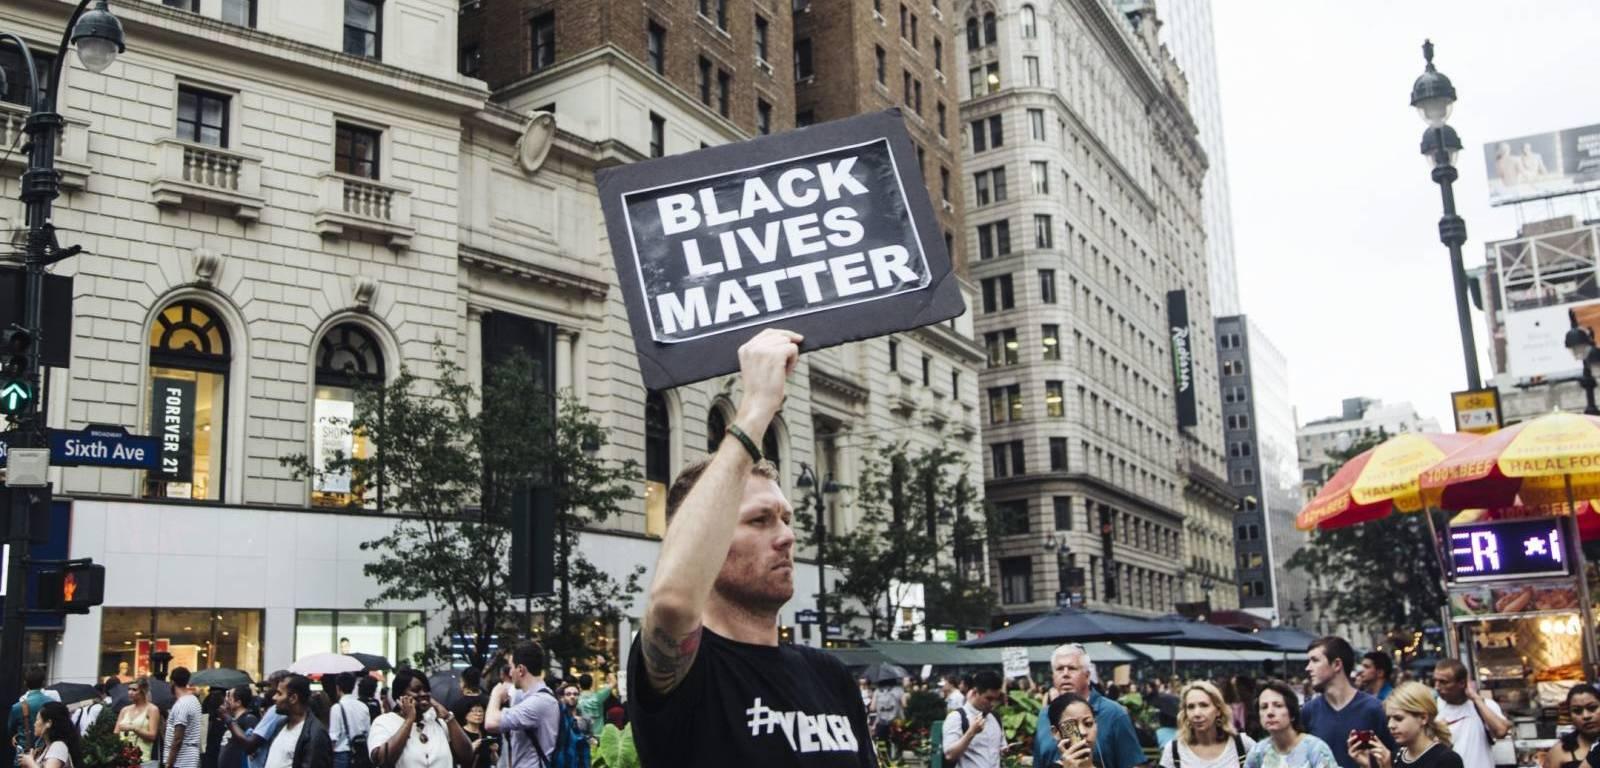 Black-lives-matter-Permanencias-Voluntarias